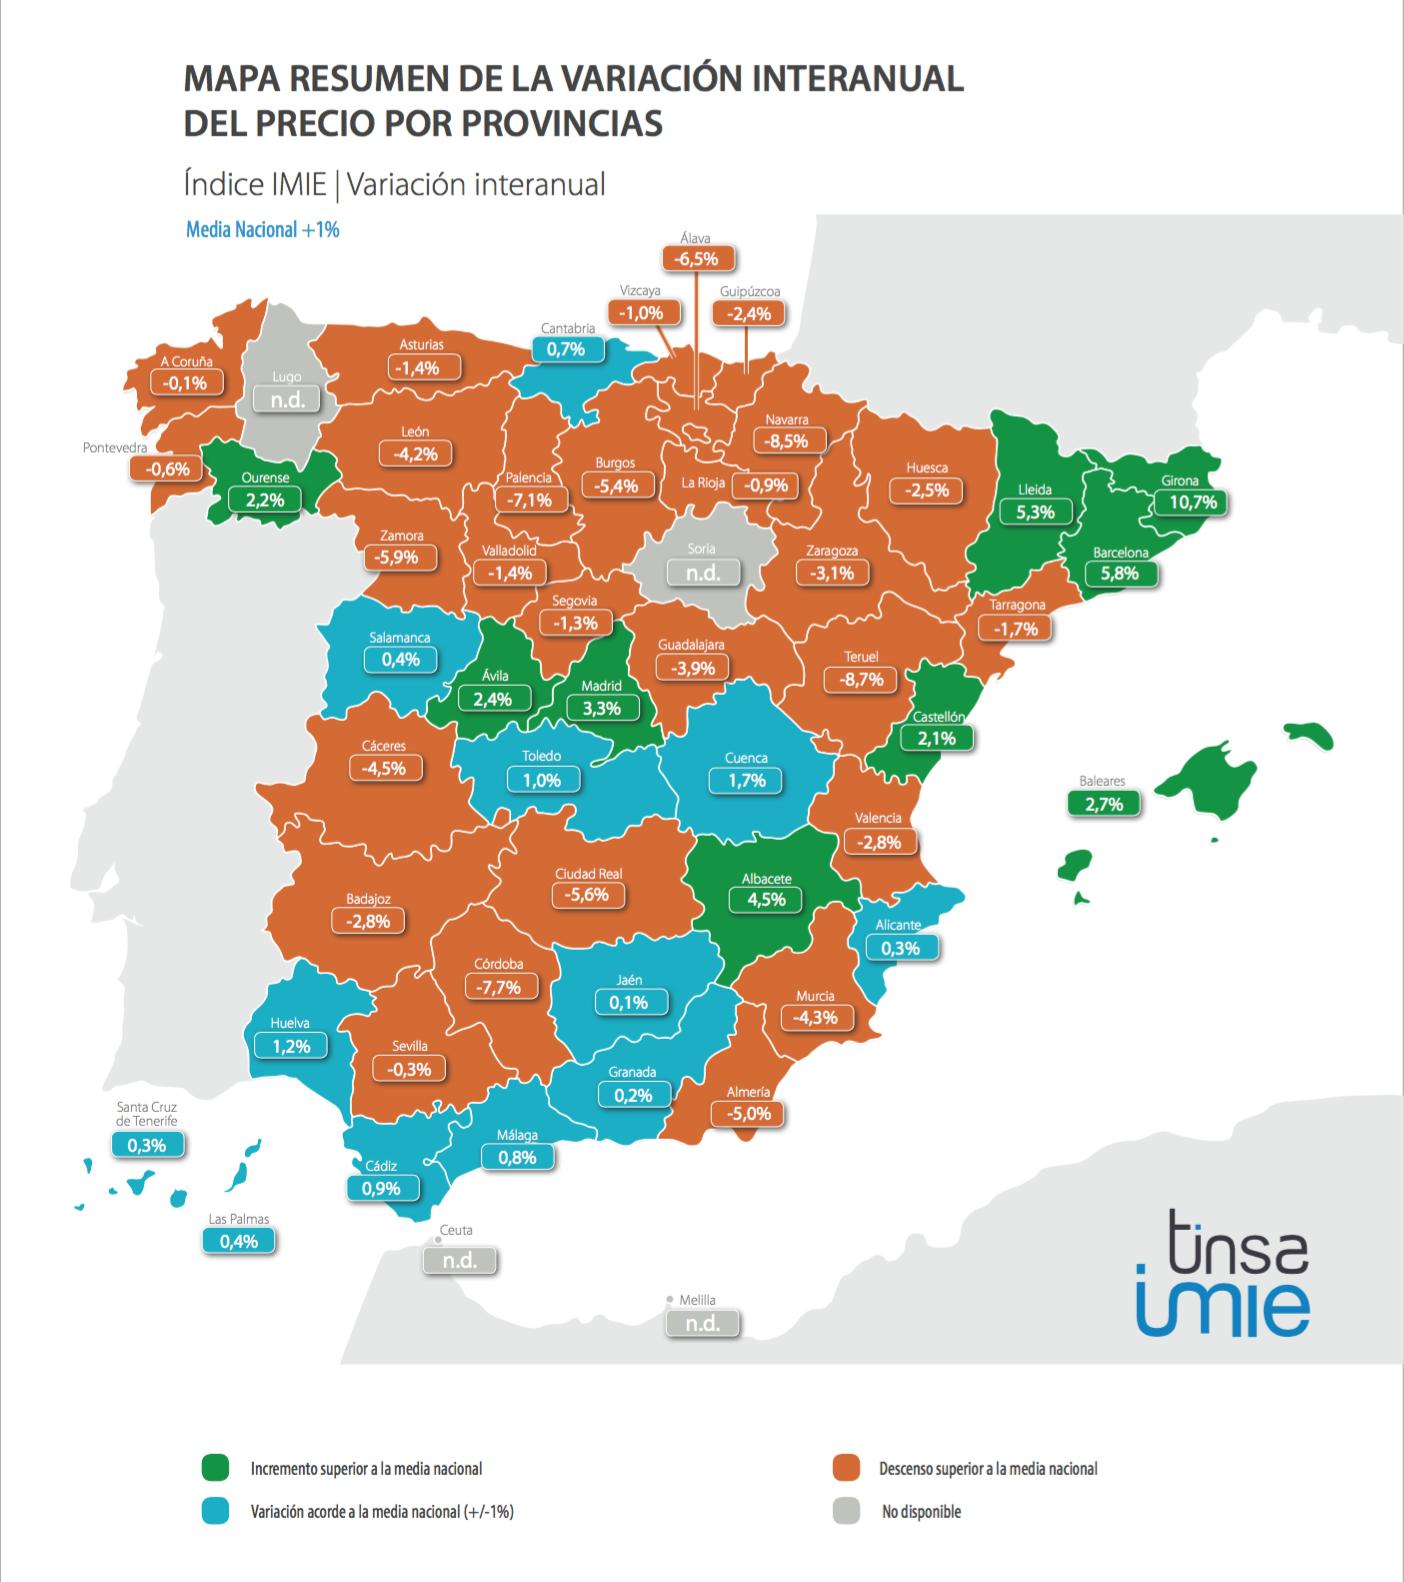 mapa-provincias-imie-ml-4t2015